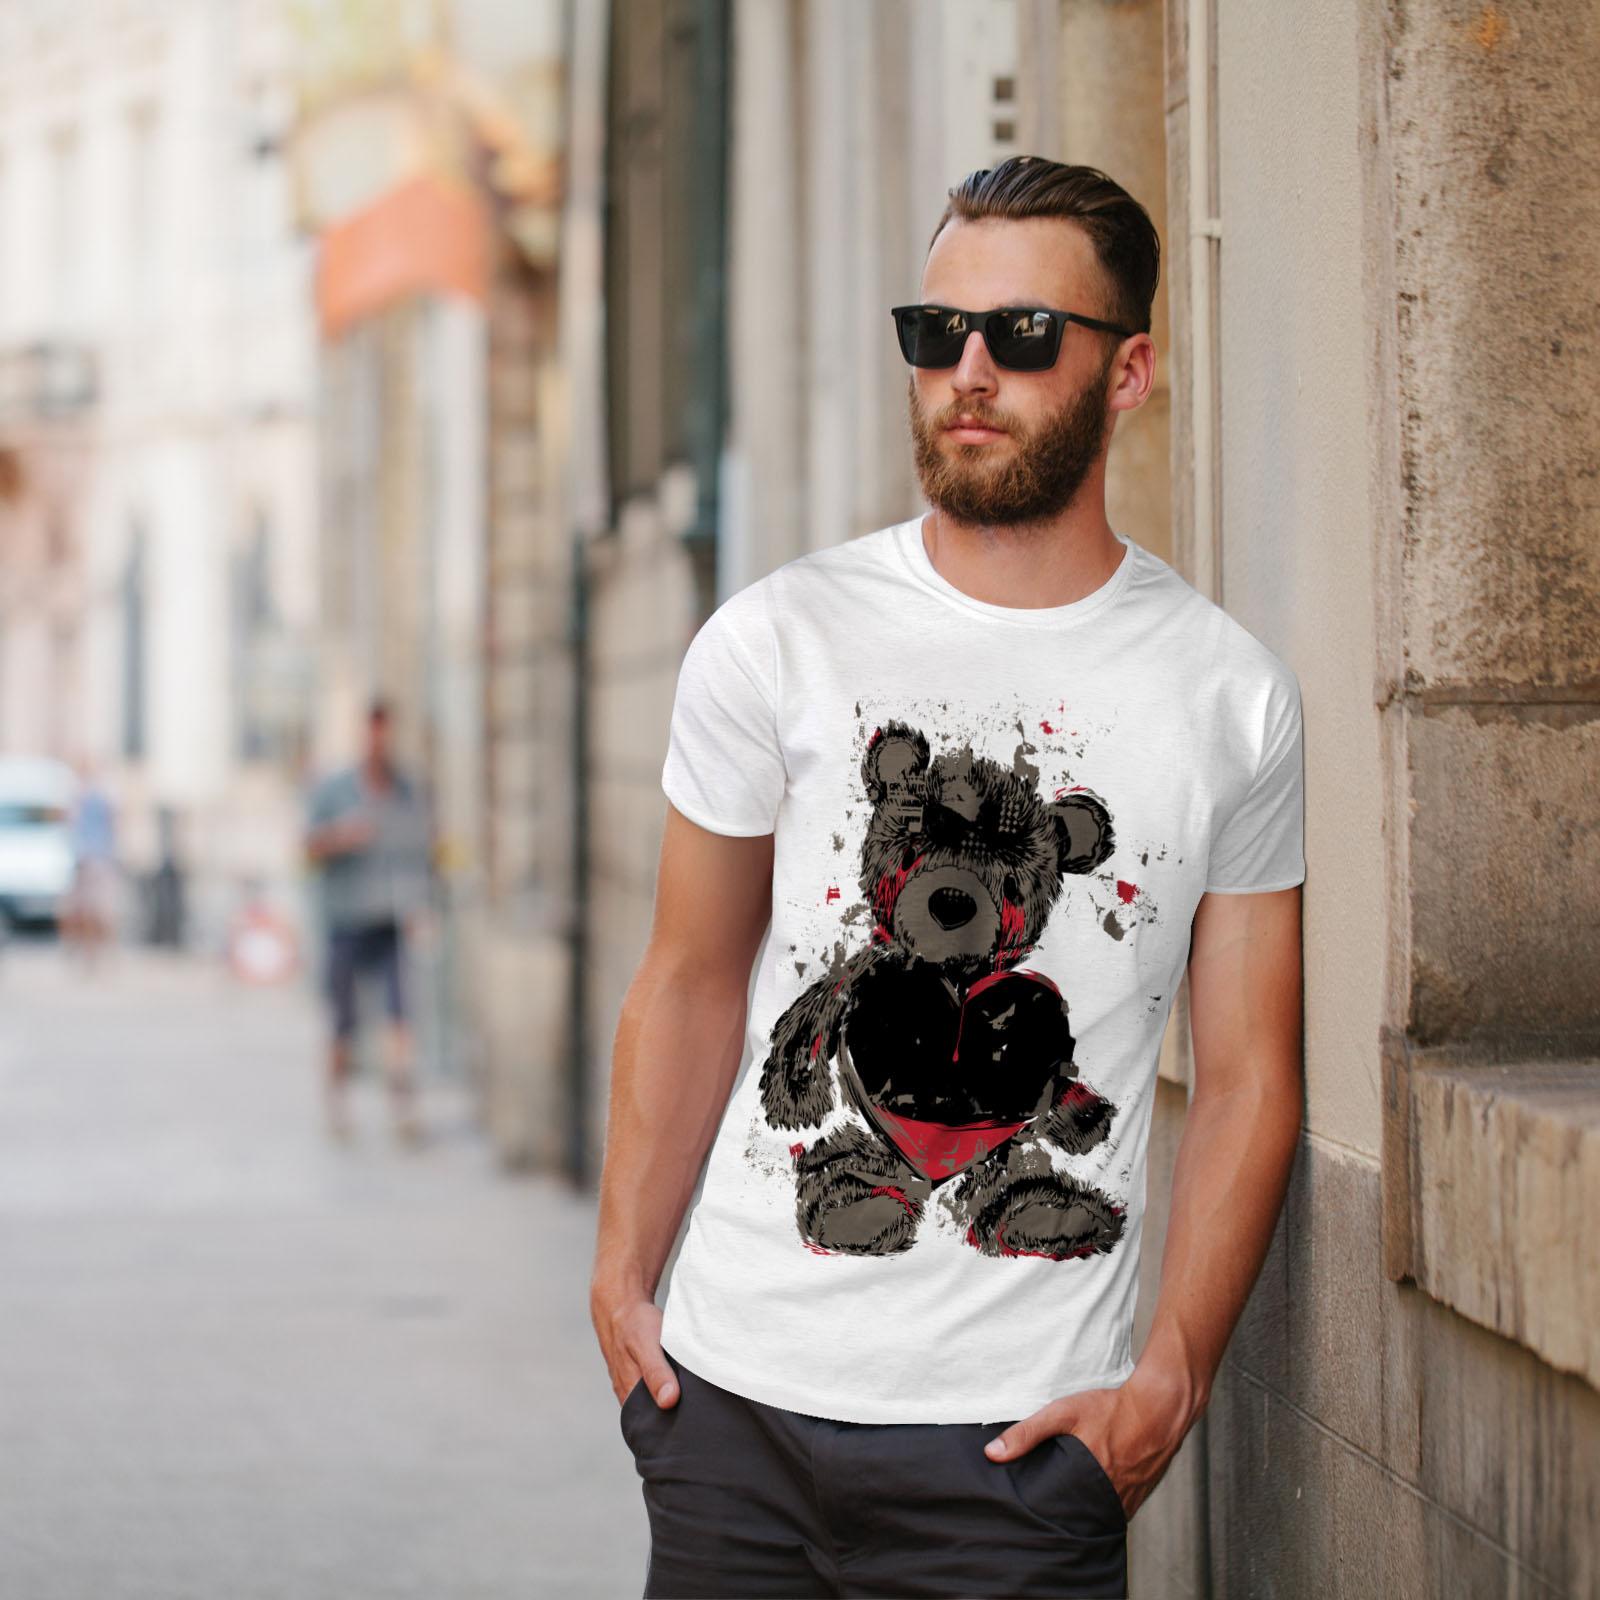 miniature 11 - Wellcoda Teddy Bear Love Hurt Mens T-shirt, Blood Graphic Design Printed Tee